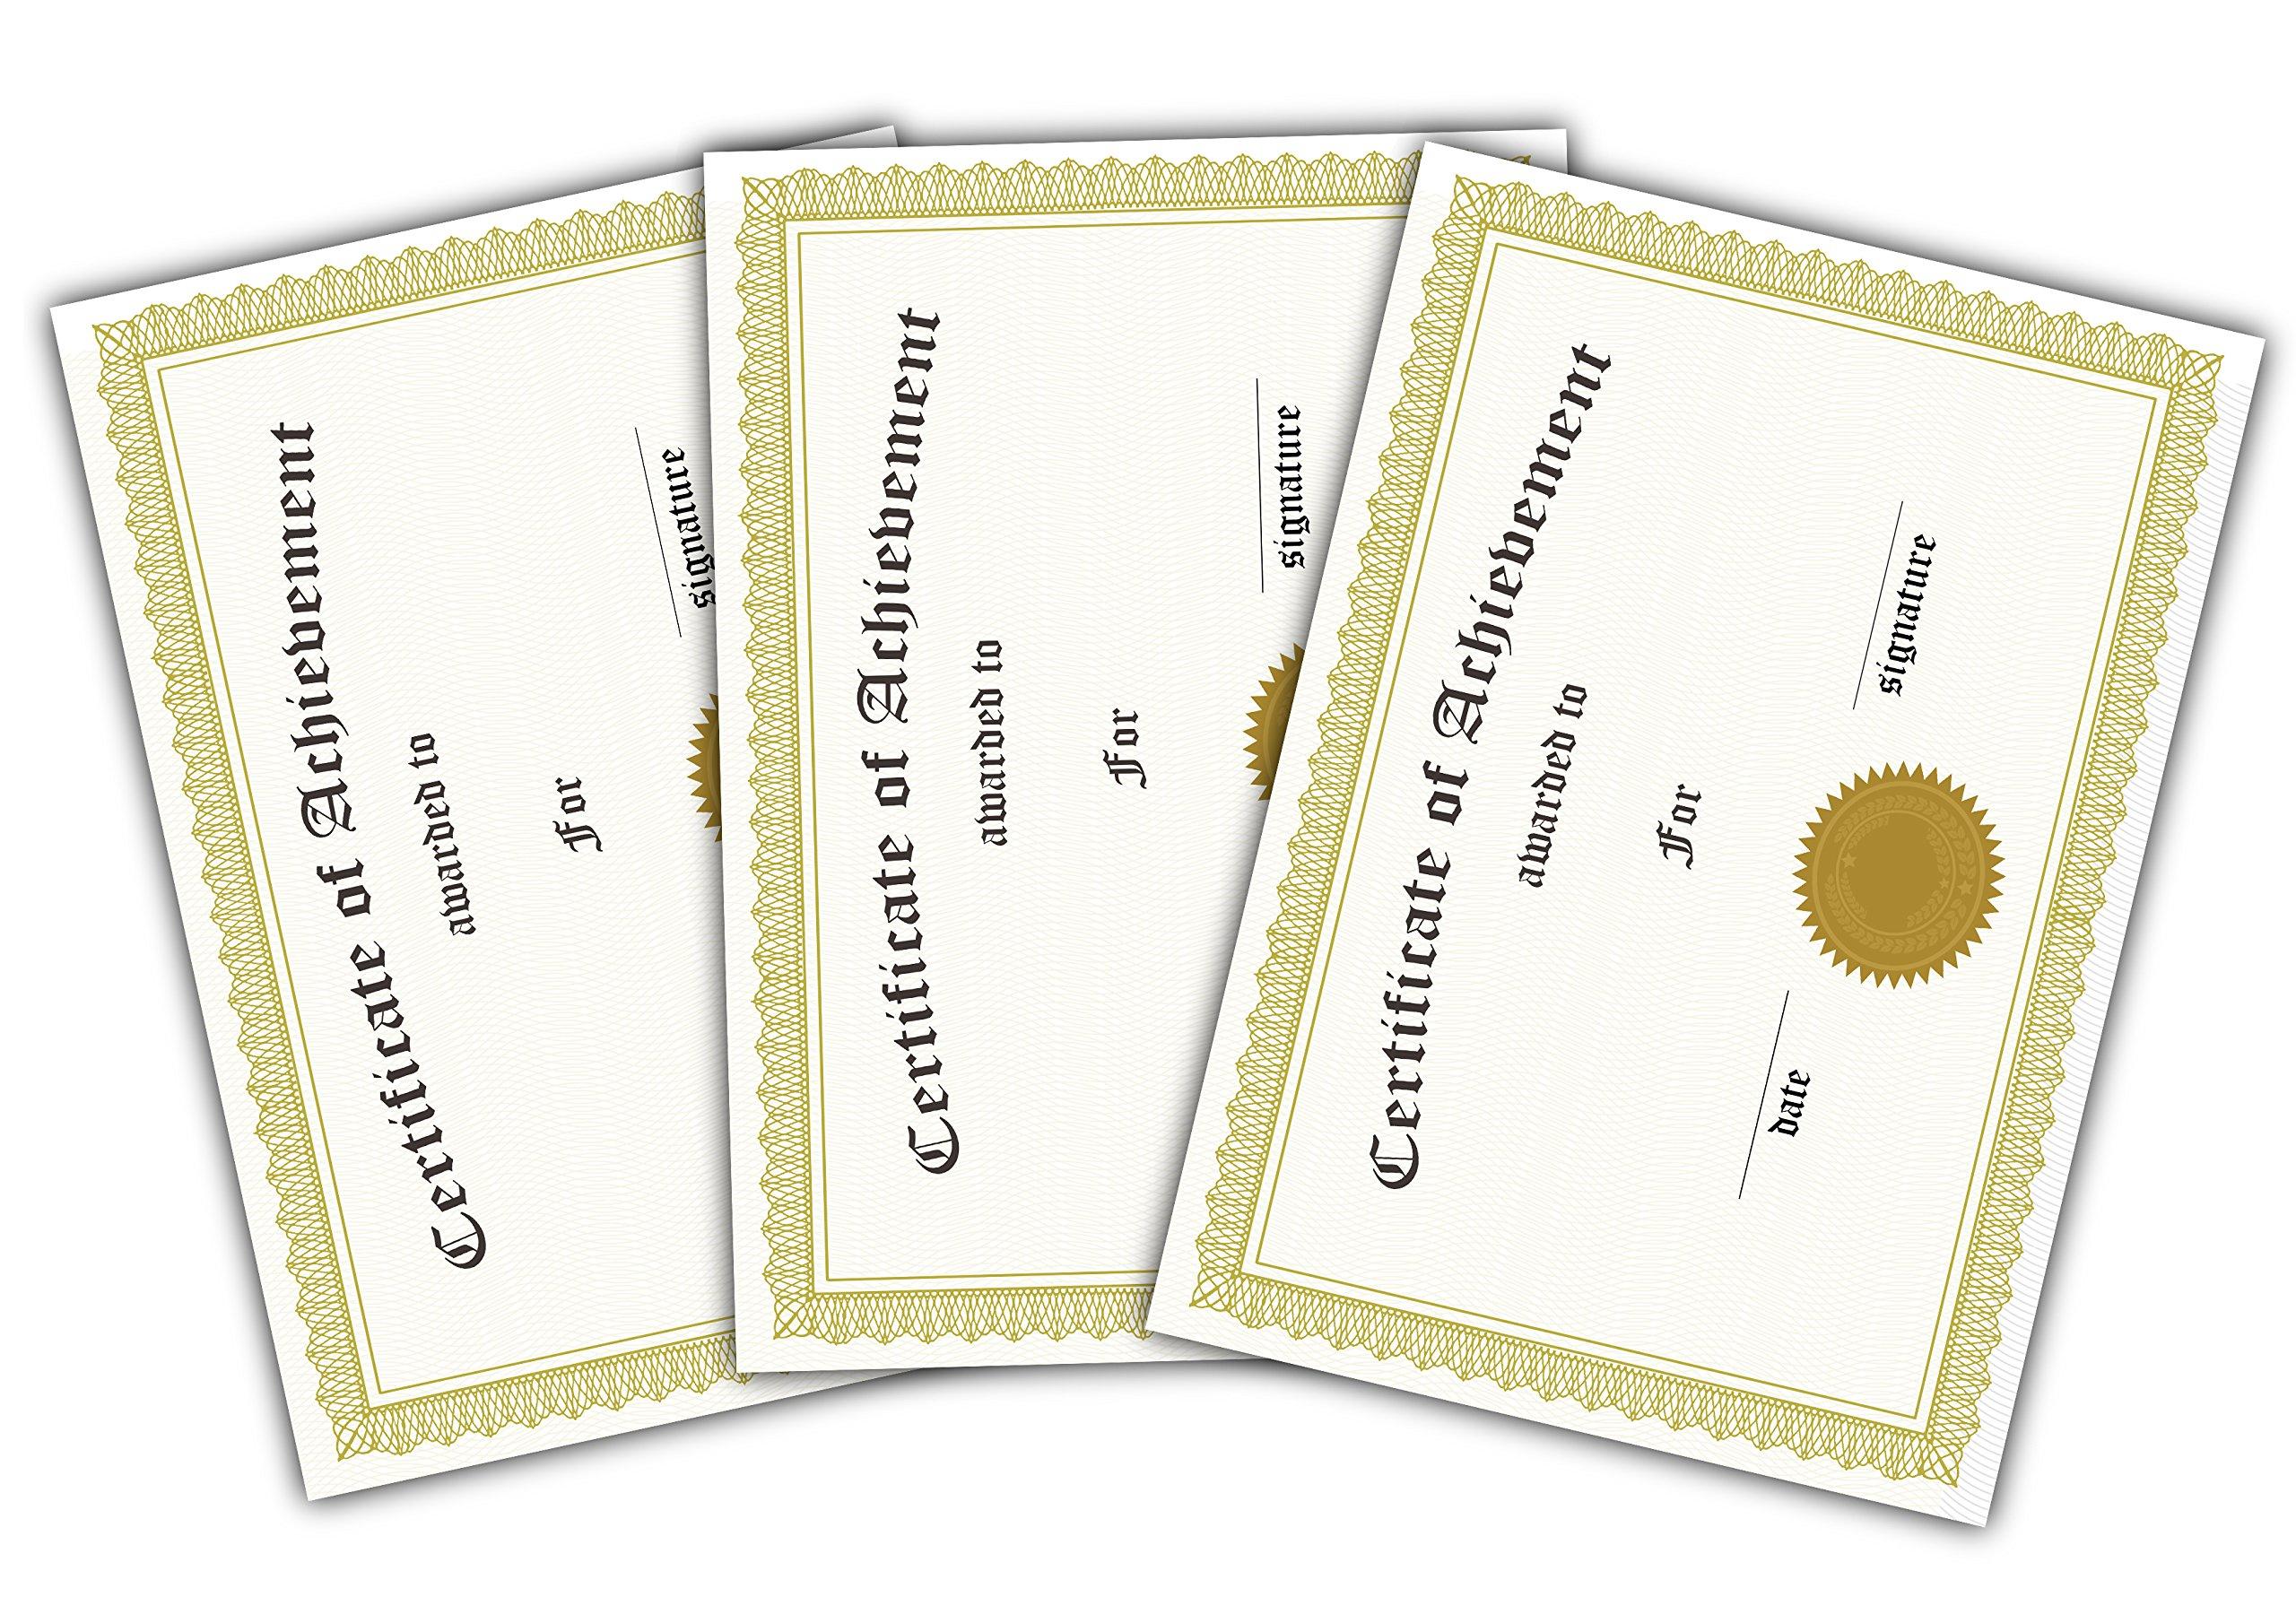 Certificate of Achievement Gold Filigree Landscape A5 Pack of 12